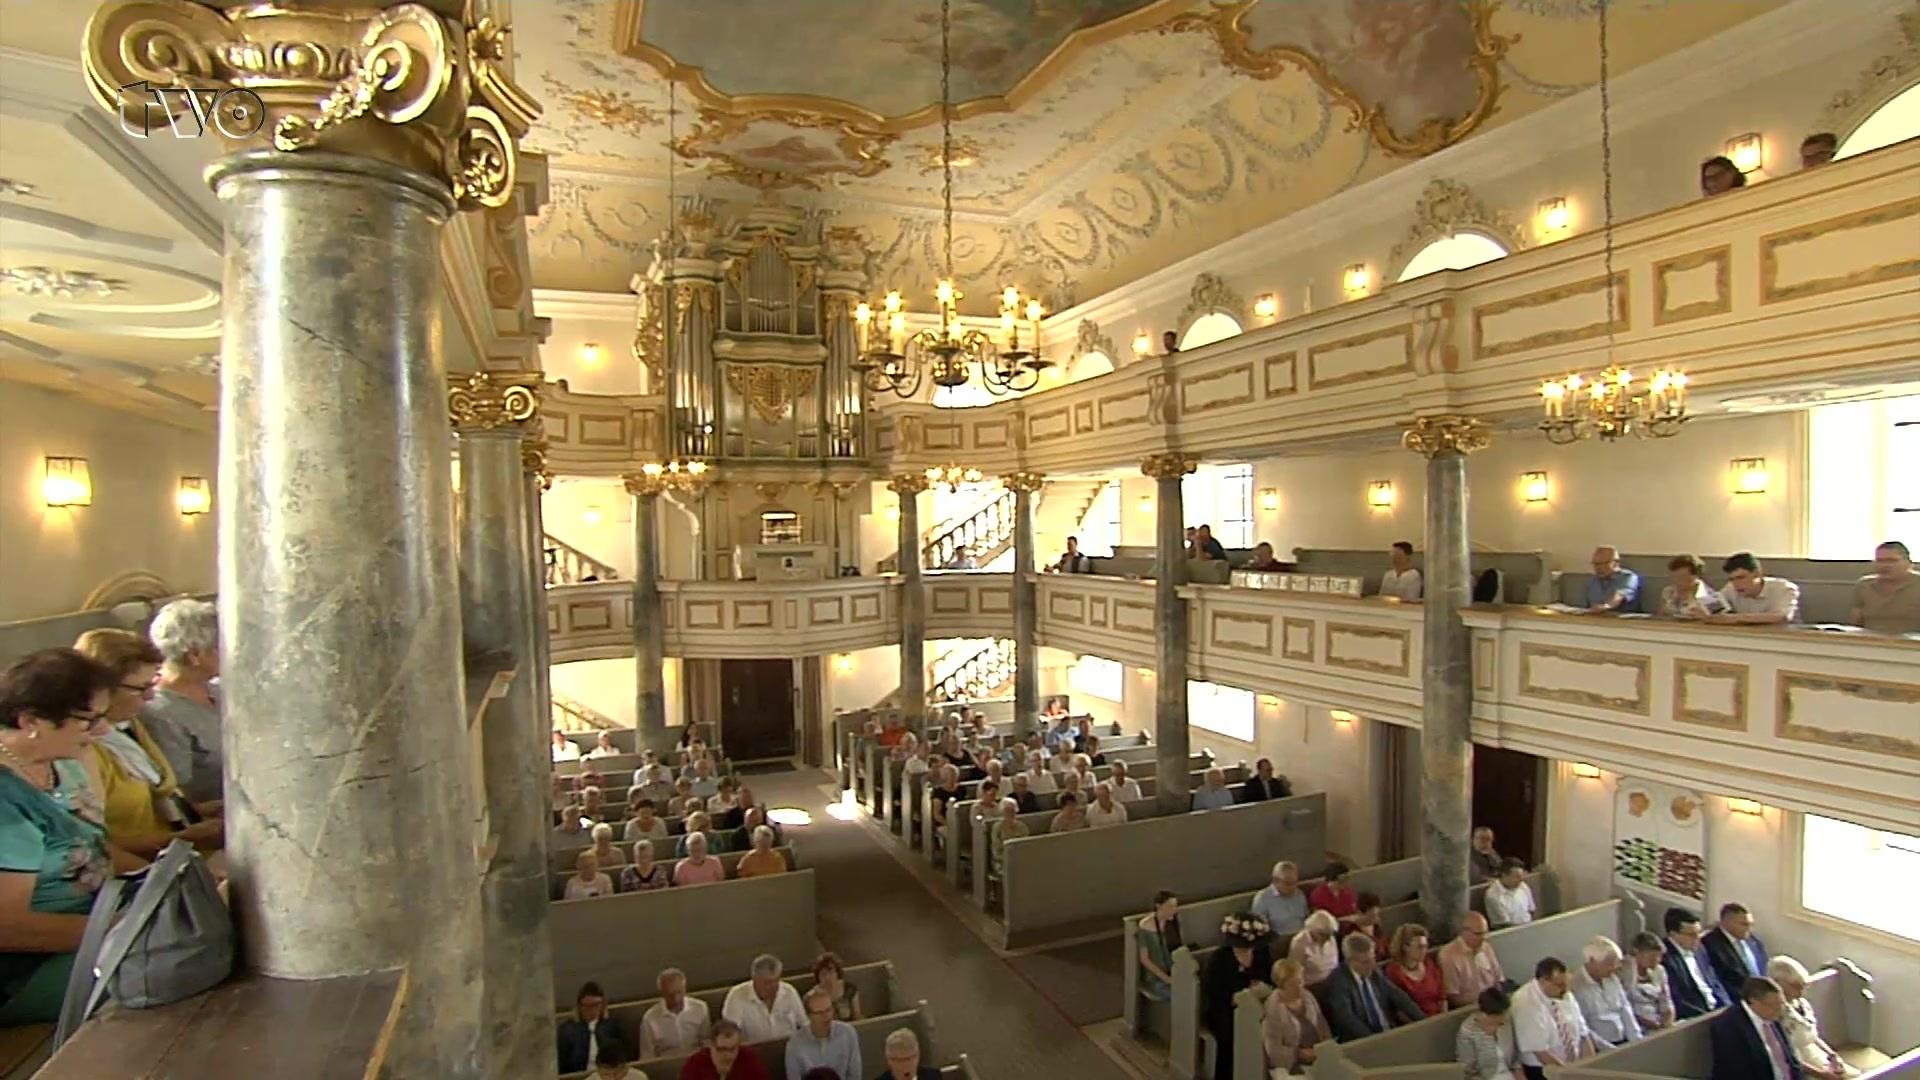 Grüß Gott Oberfranken vom 26. Juli 2017   tvo.de